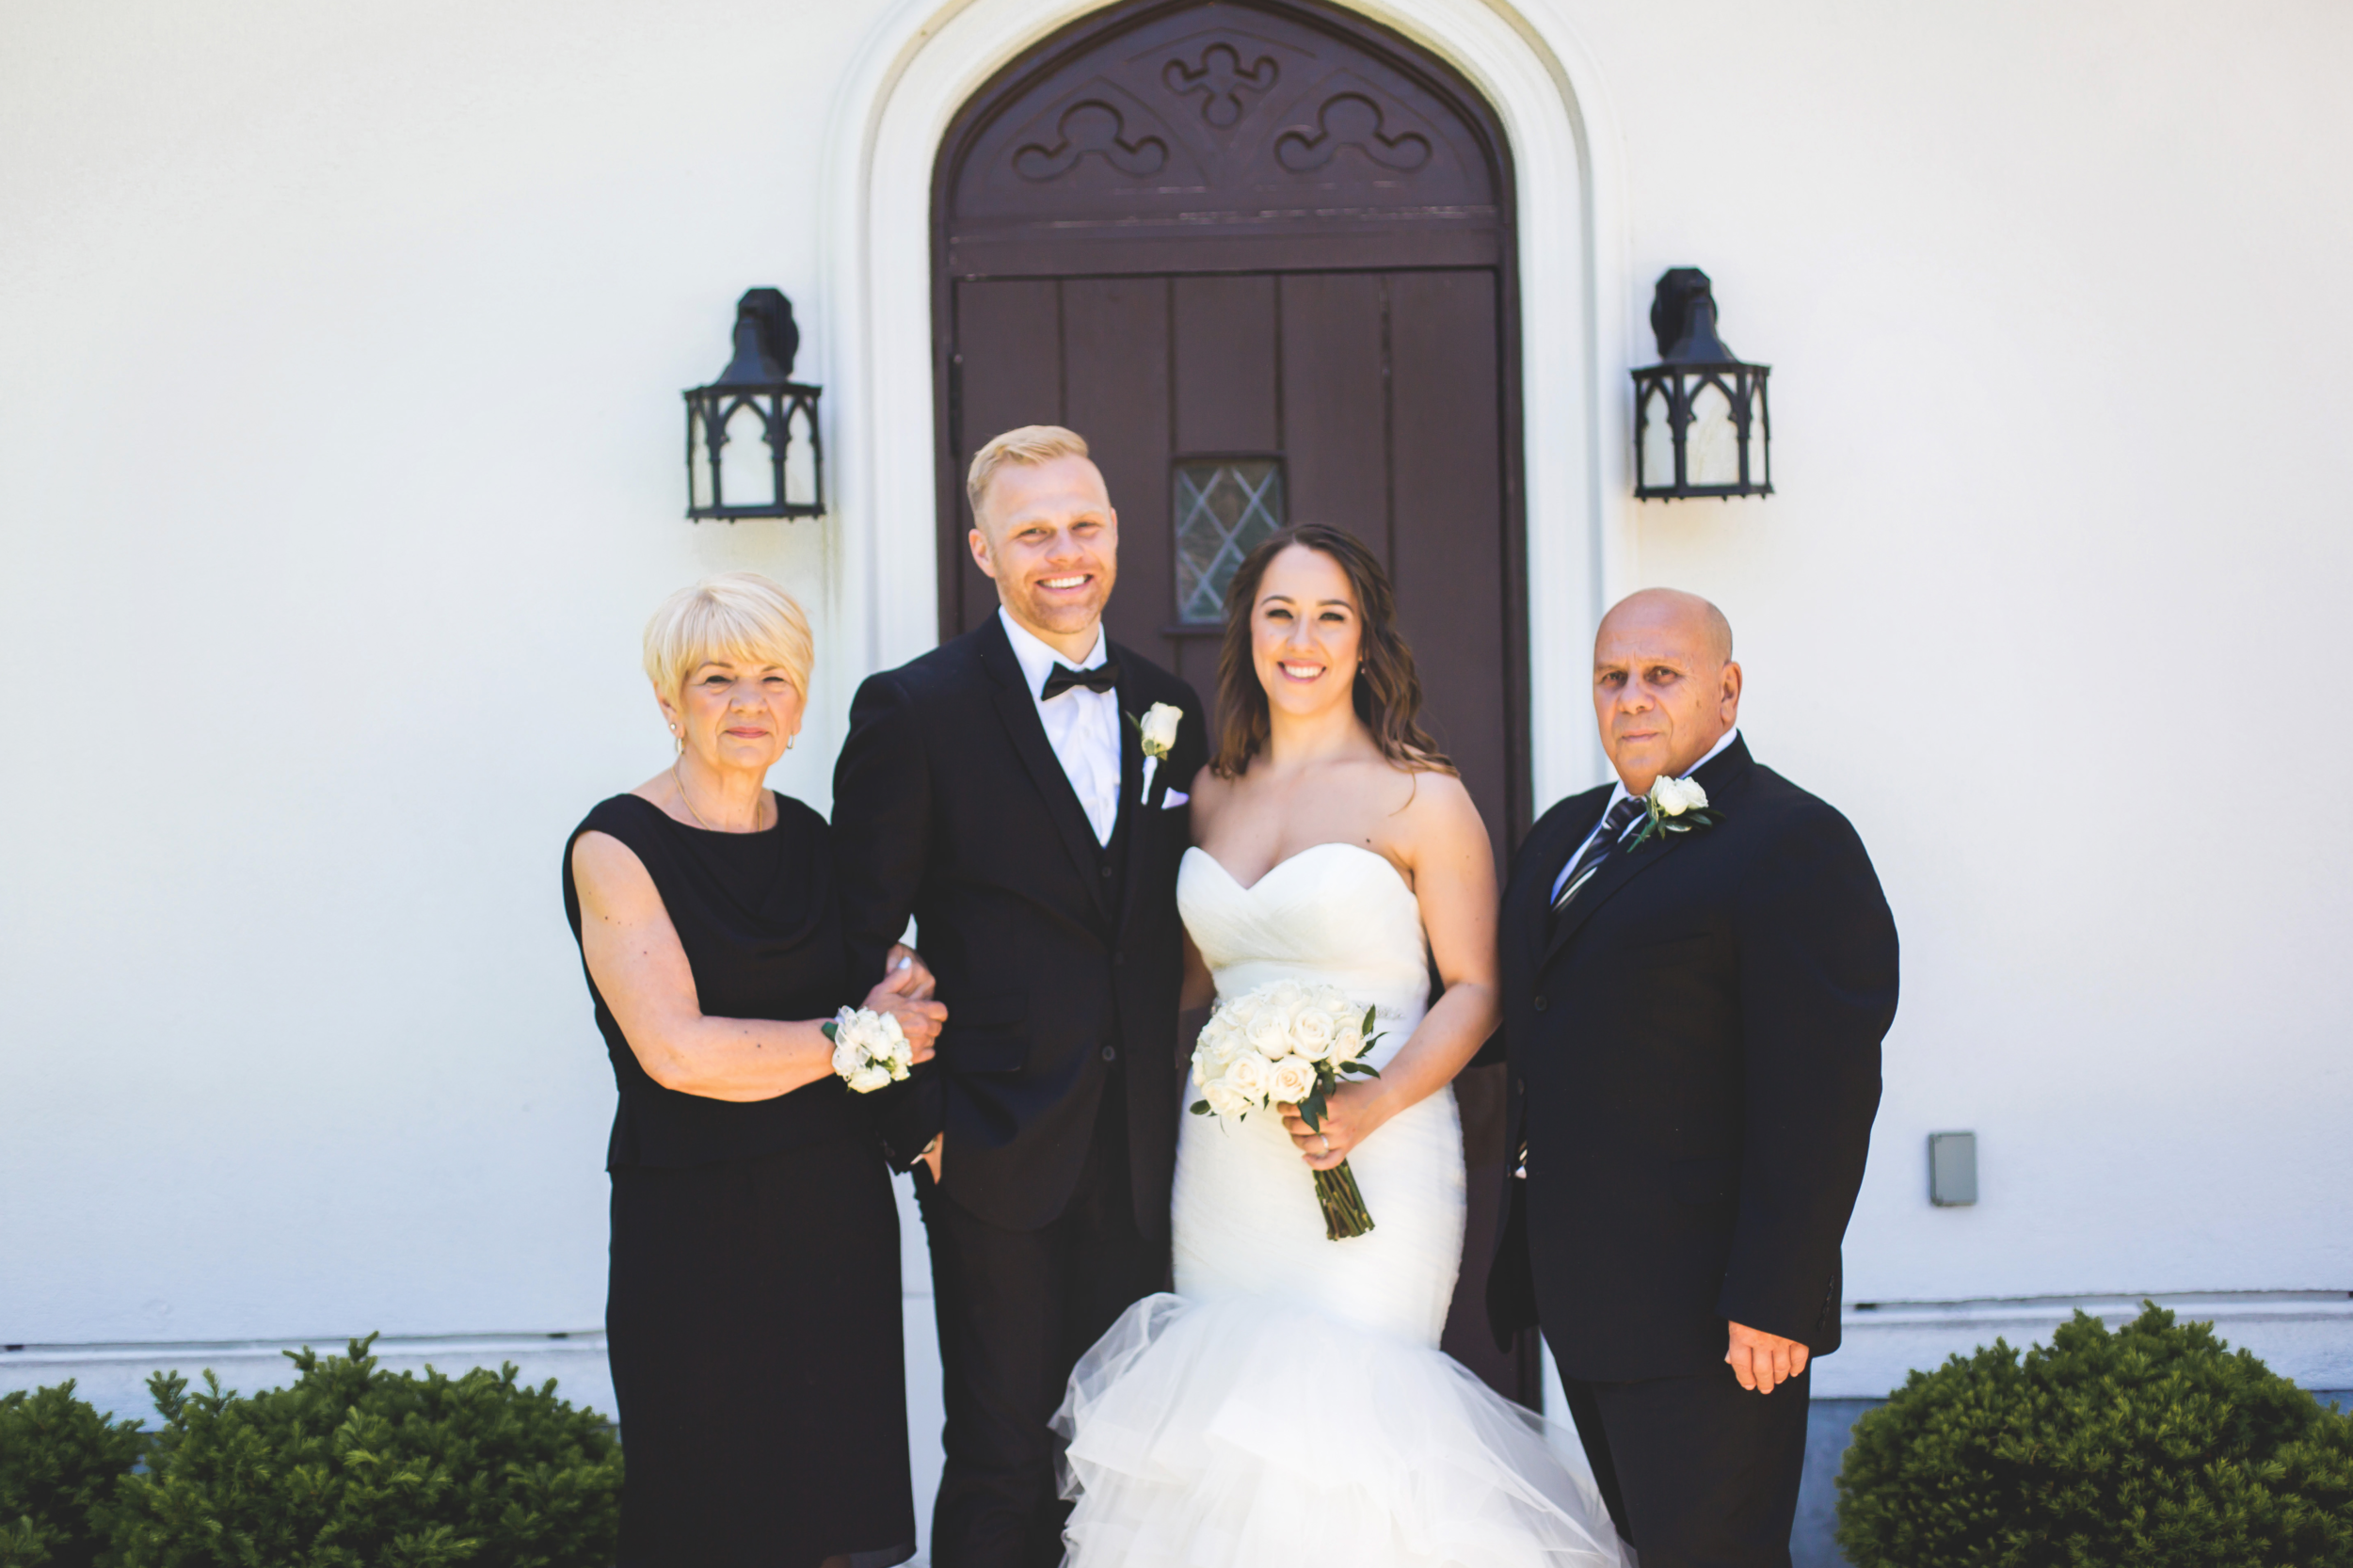 Wedding-Harbour-Banquet-Center-Oakville-Photographer-Wedding-Hamilton-Saint-James-Espresso-Downtown-HamOnt-GTA-Niagara-Toronto-Moments-by-Lauren-Photography-Photo-Image-20.png